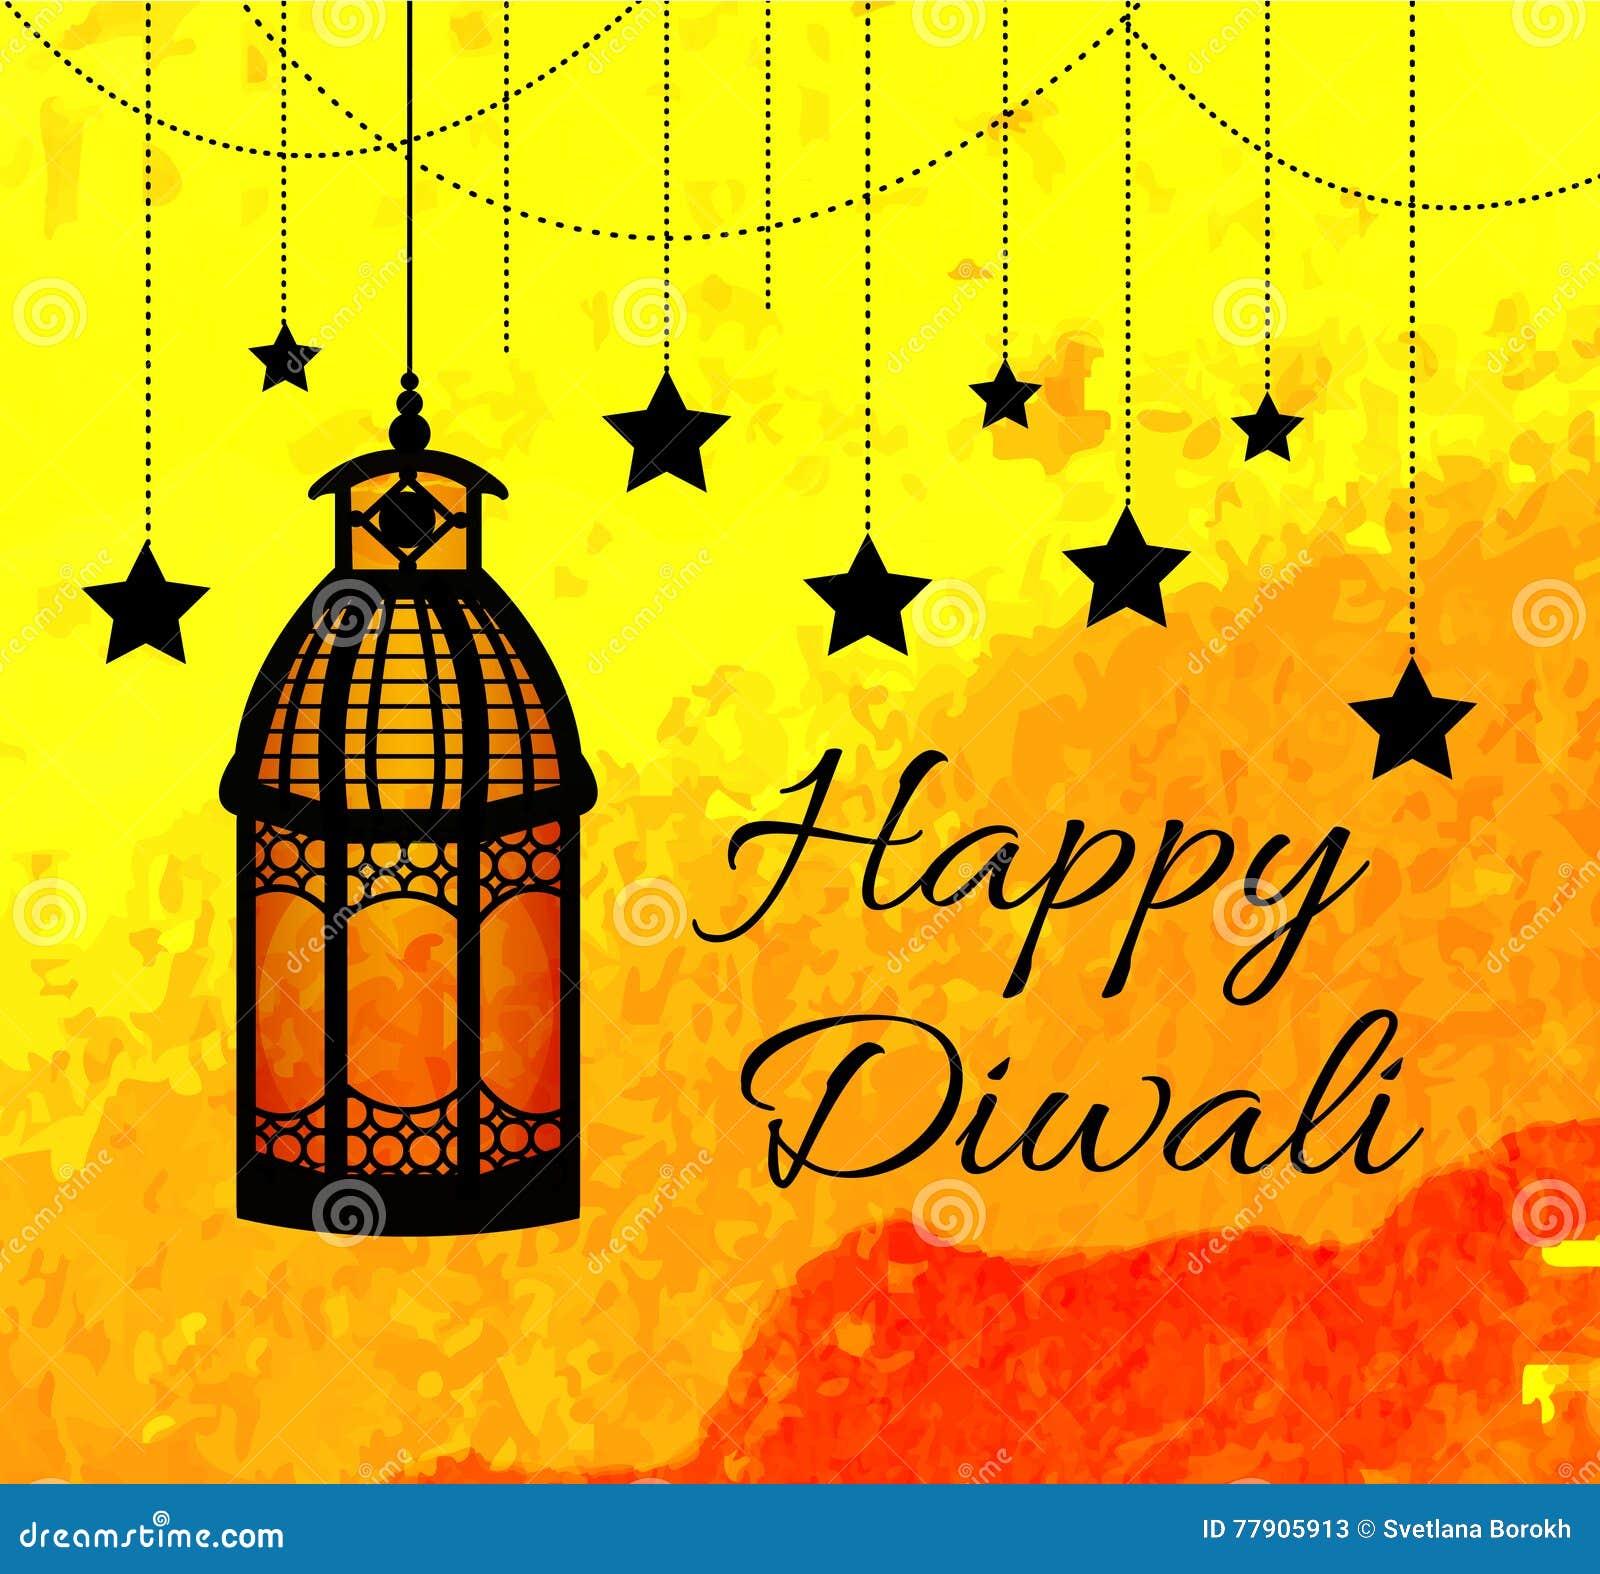 Happy diwali indian festival of lights diwali greeting card download happy diwali indian festival of lights diwali greeting card invitation vector illustration stopboris Gallery